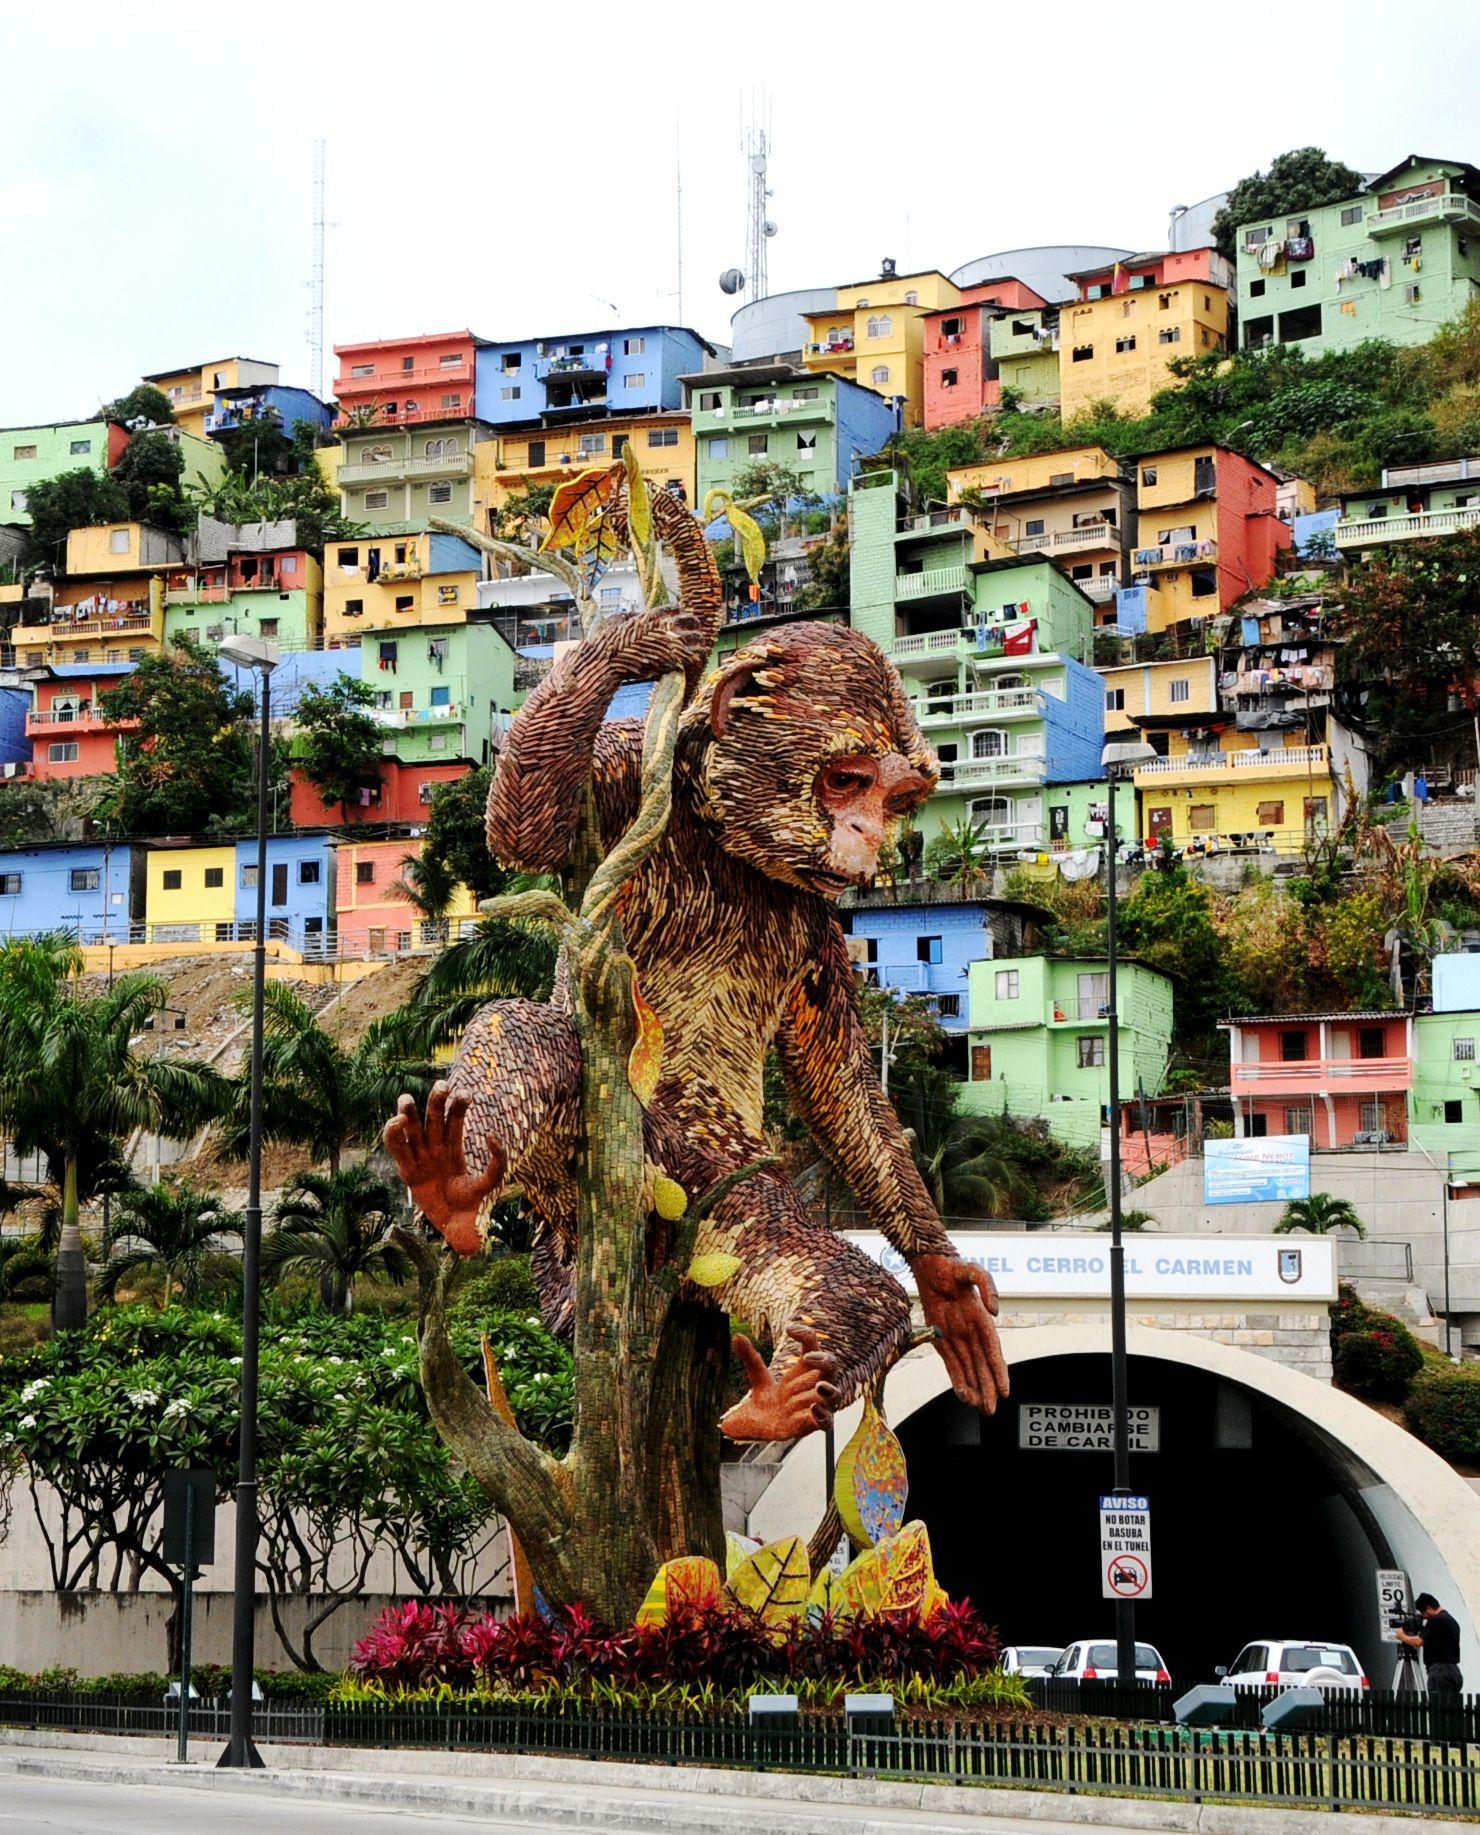 #mono #túnel #colores #concurso #subway #lentefilosofico @comsocucsg